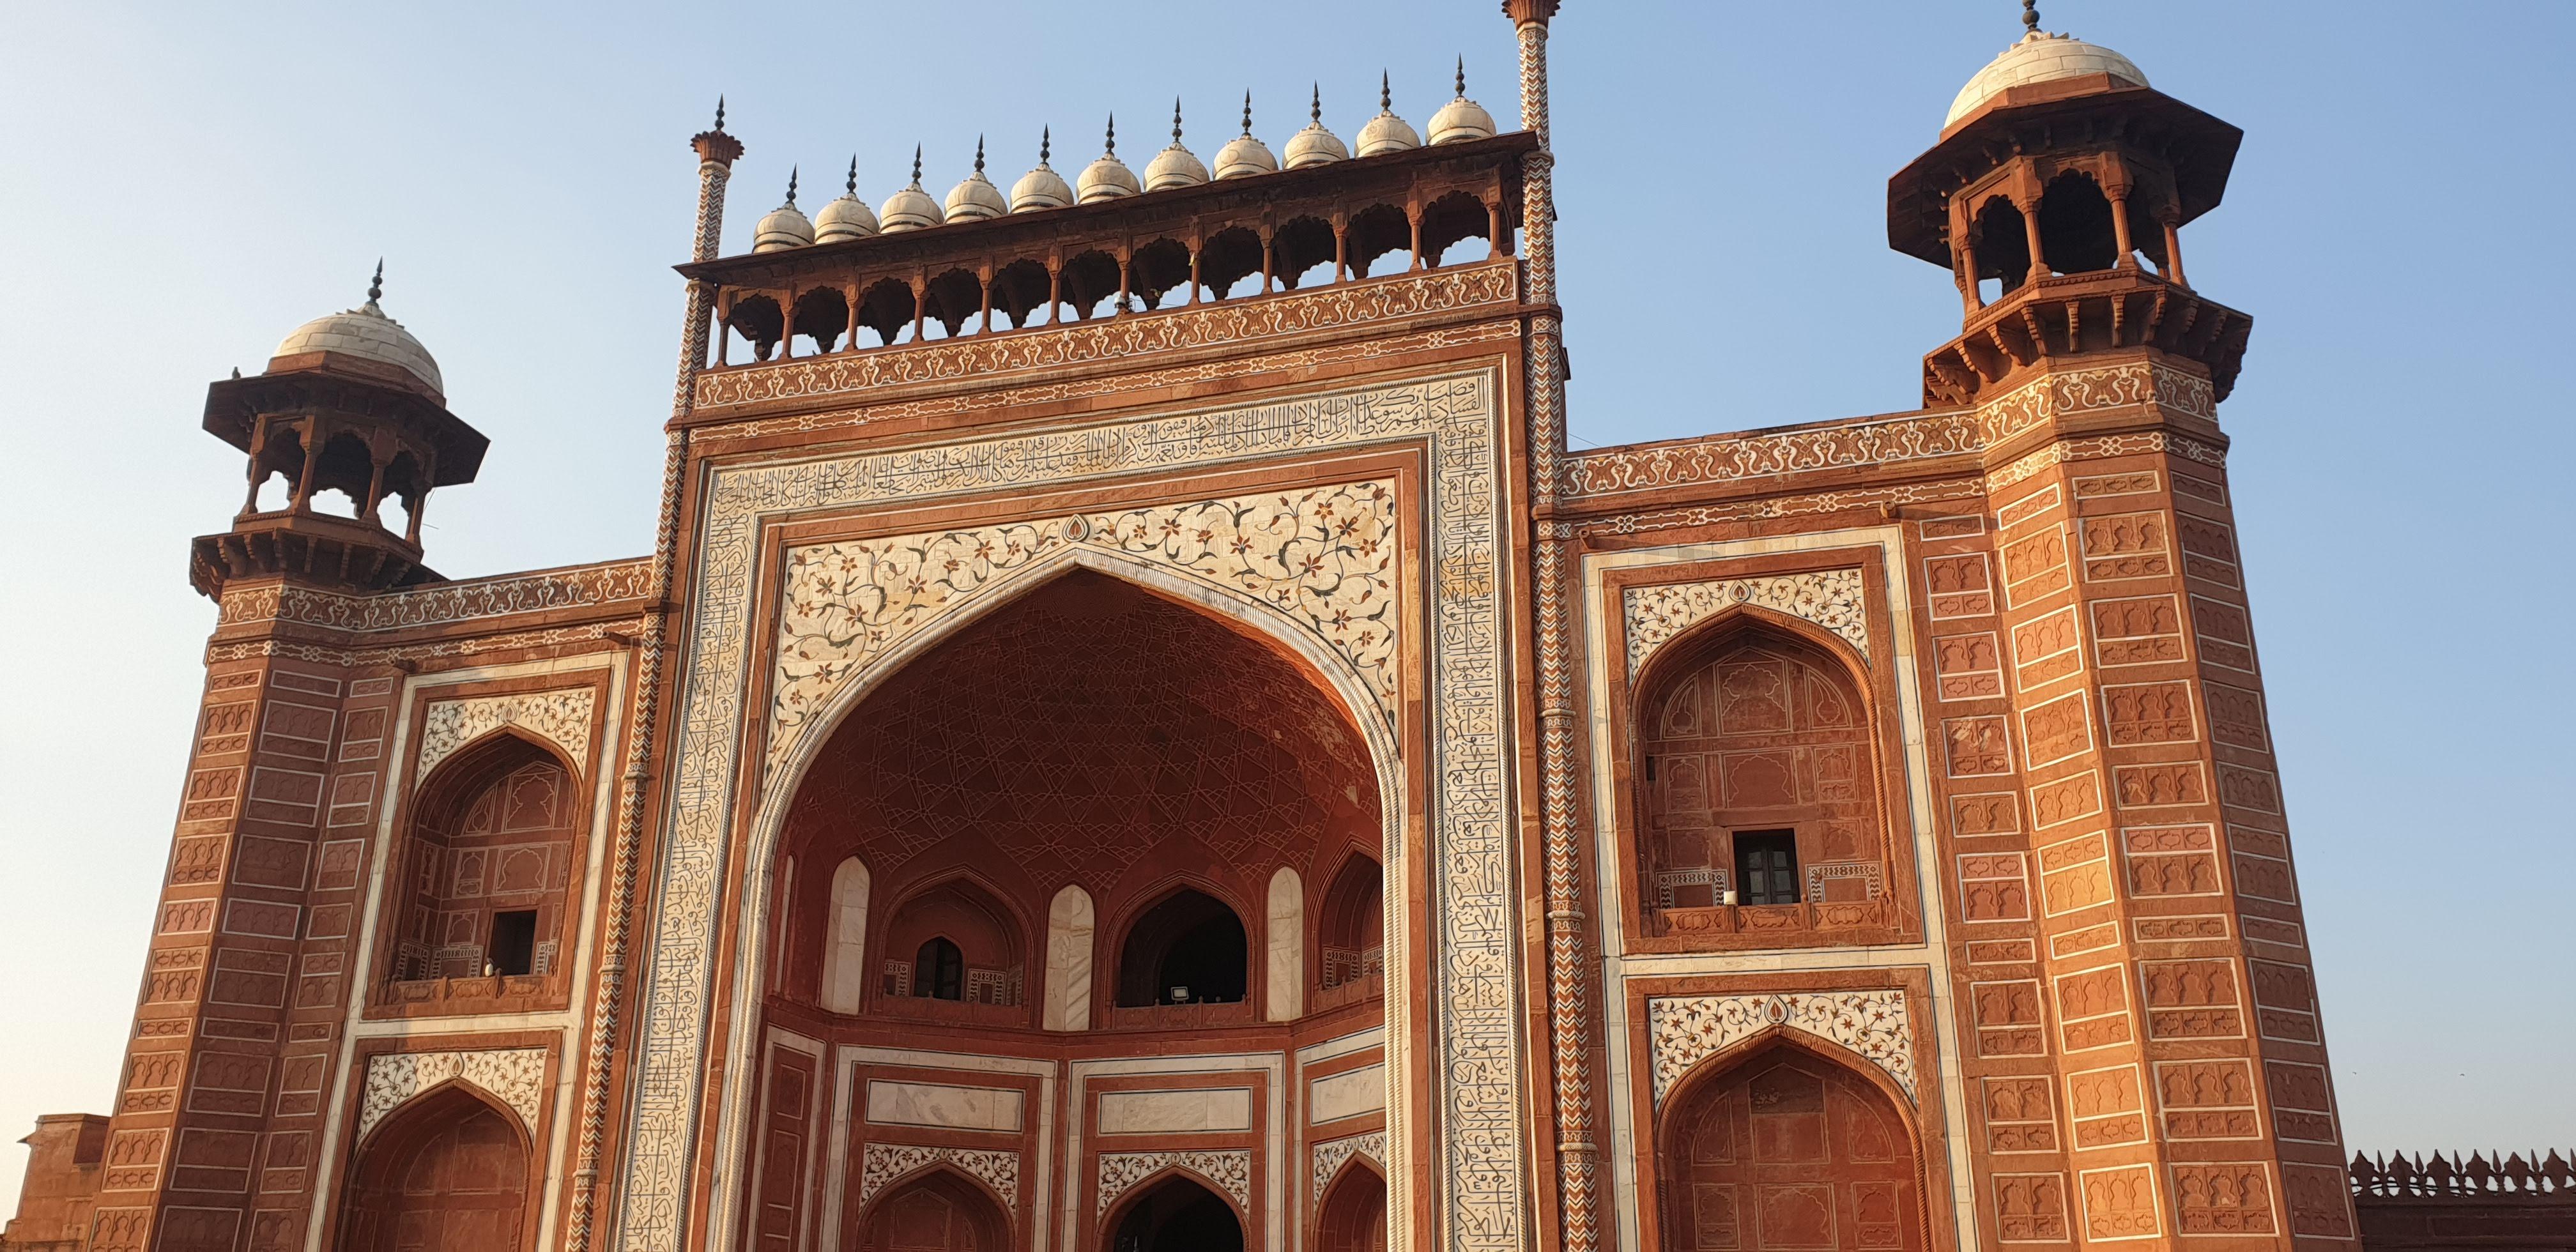 Full Day Tour of Taj Mahal from Delhi by Car